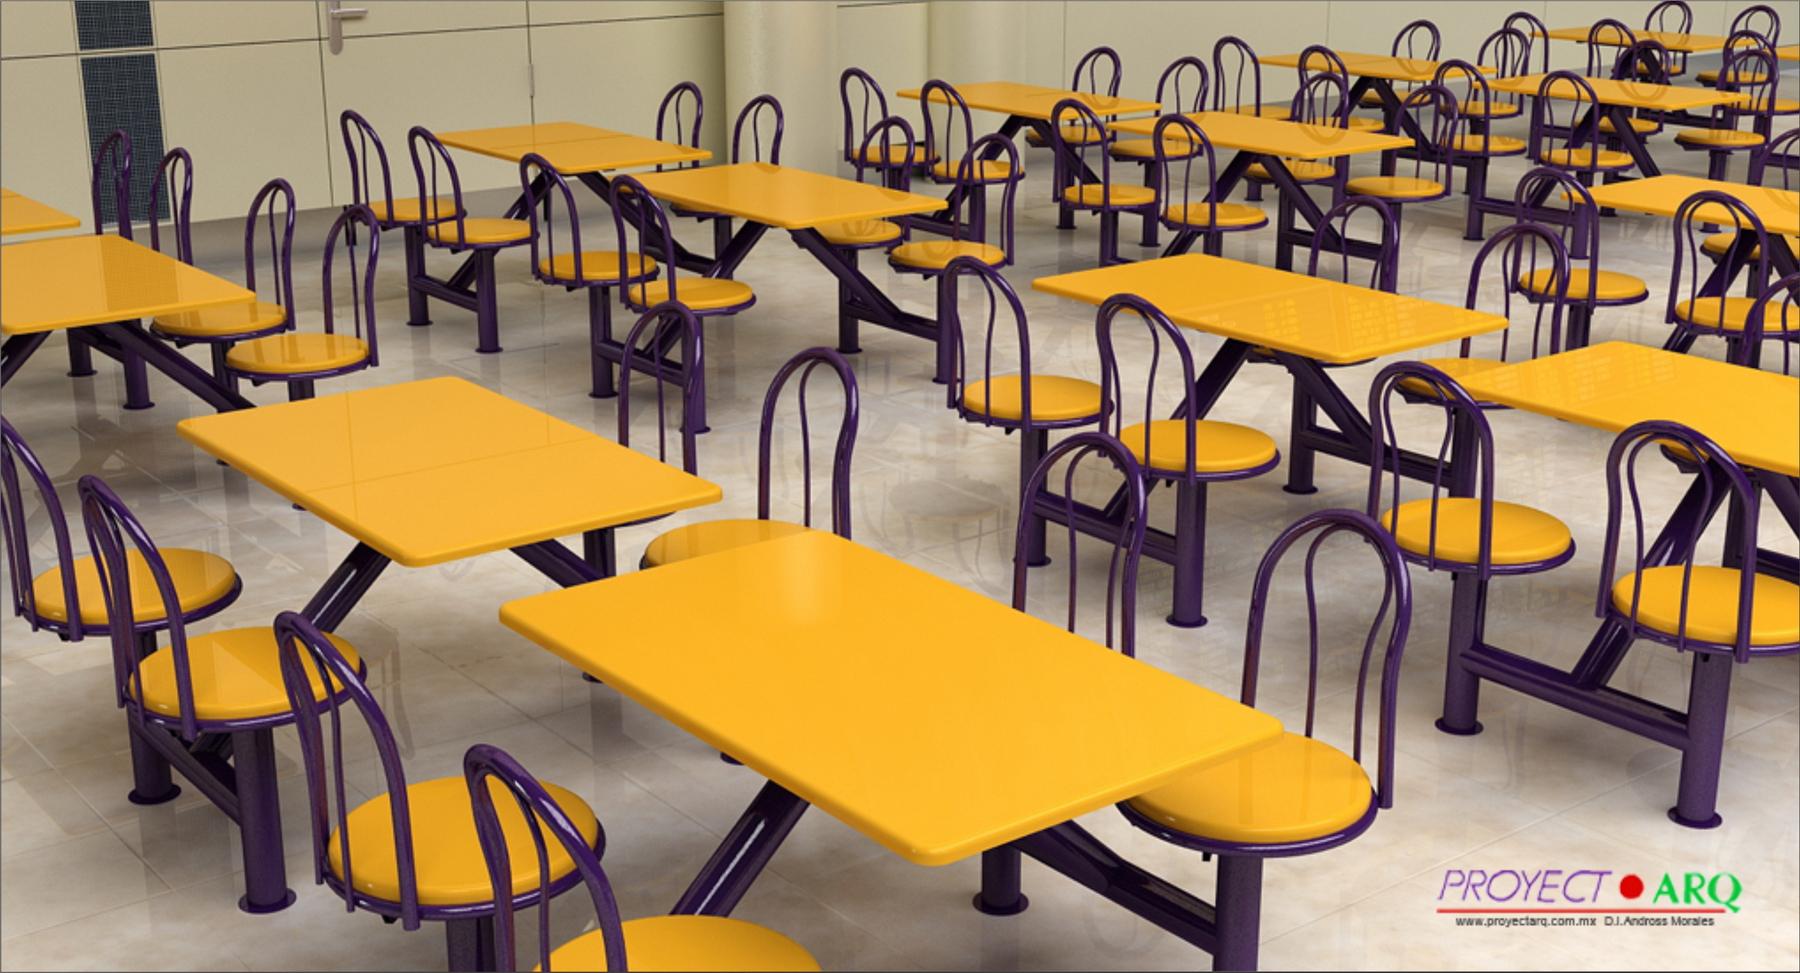 Muebles fast food guadalajara obtenga ideas dise o de for Muebles industriales madrid